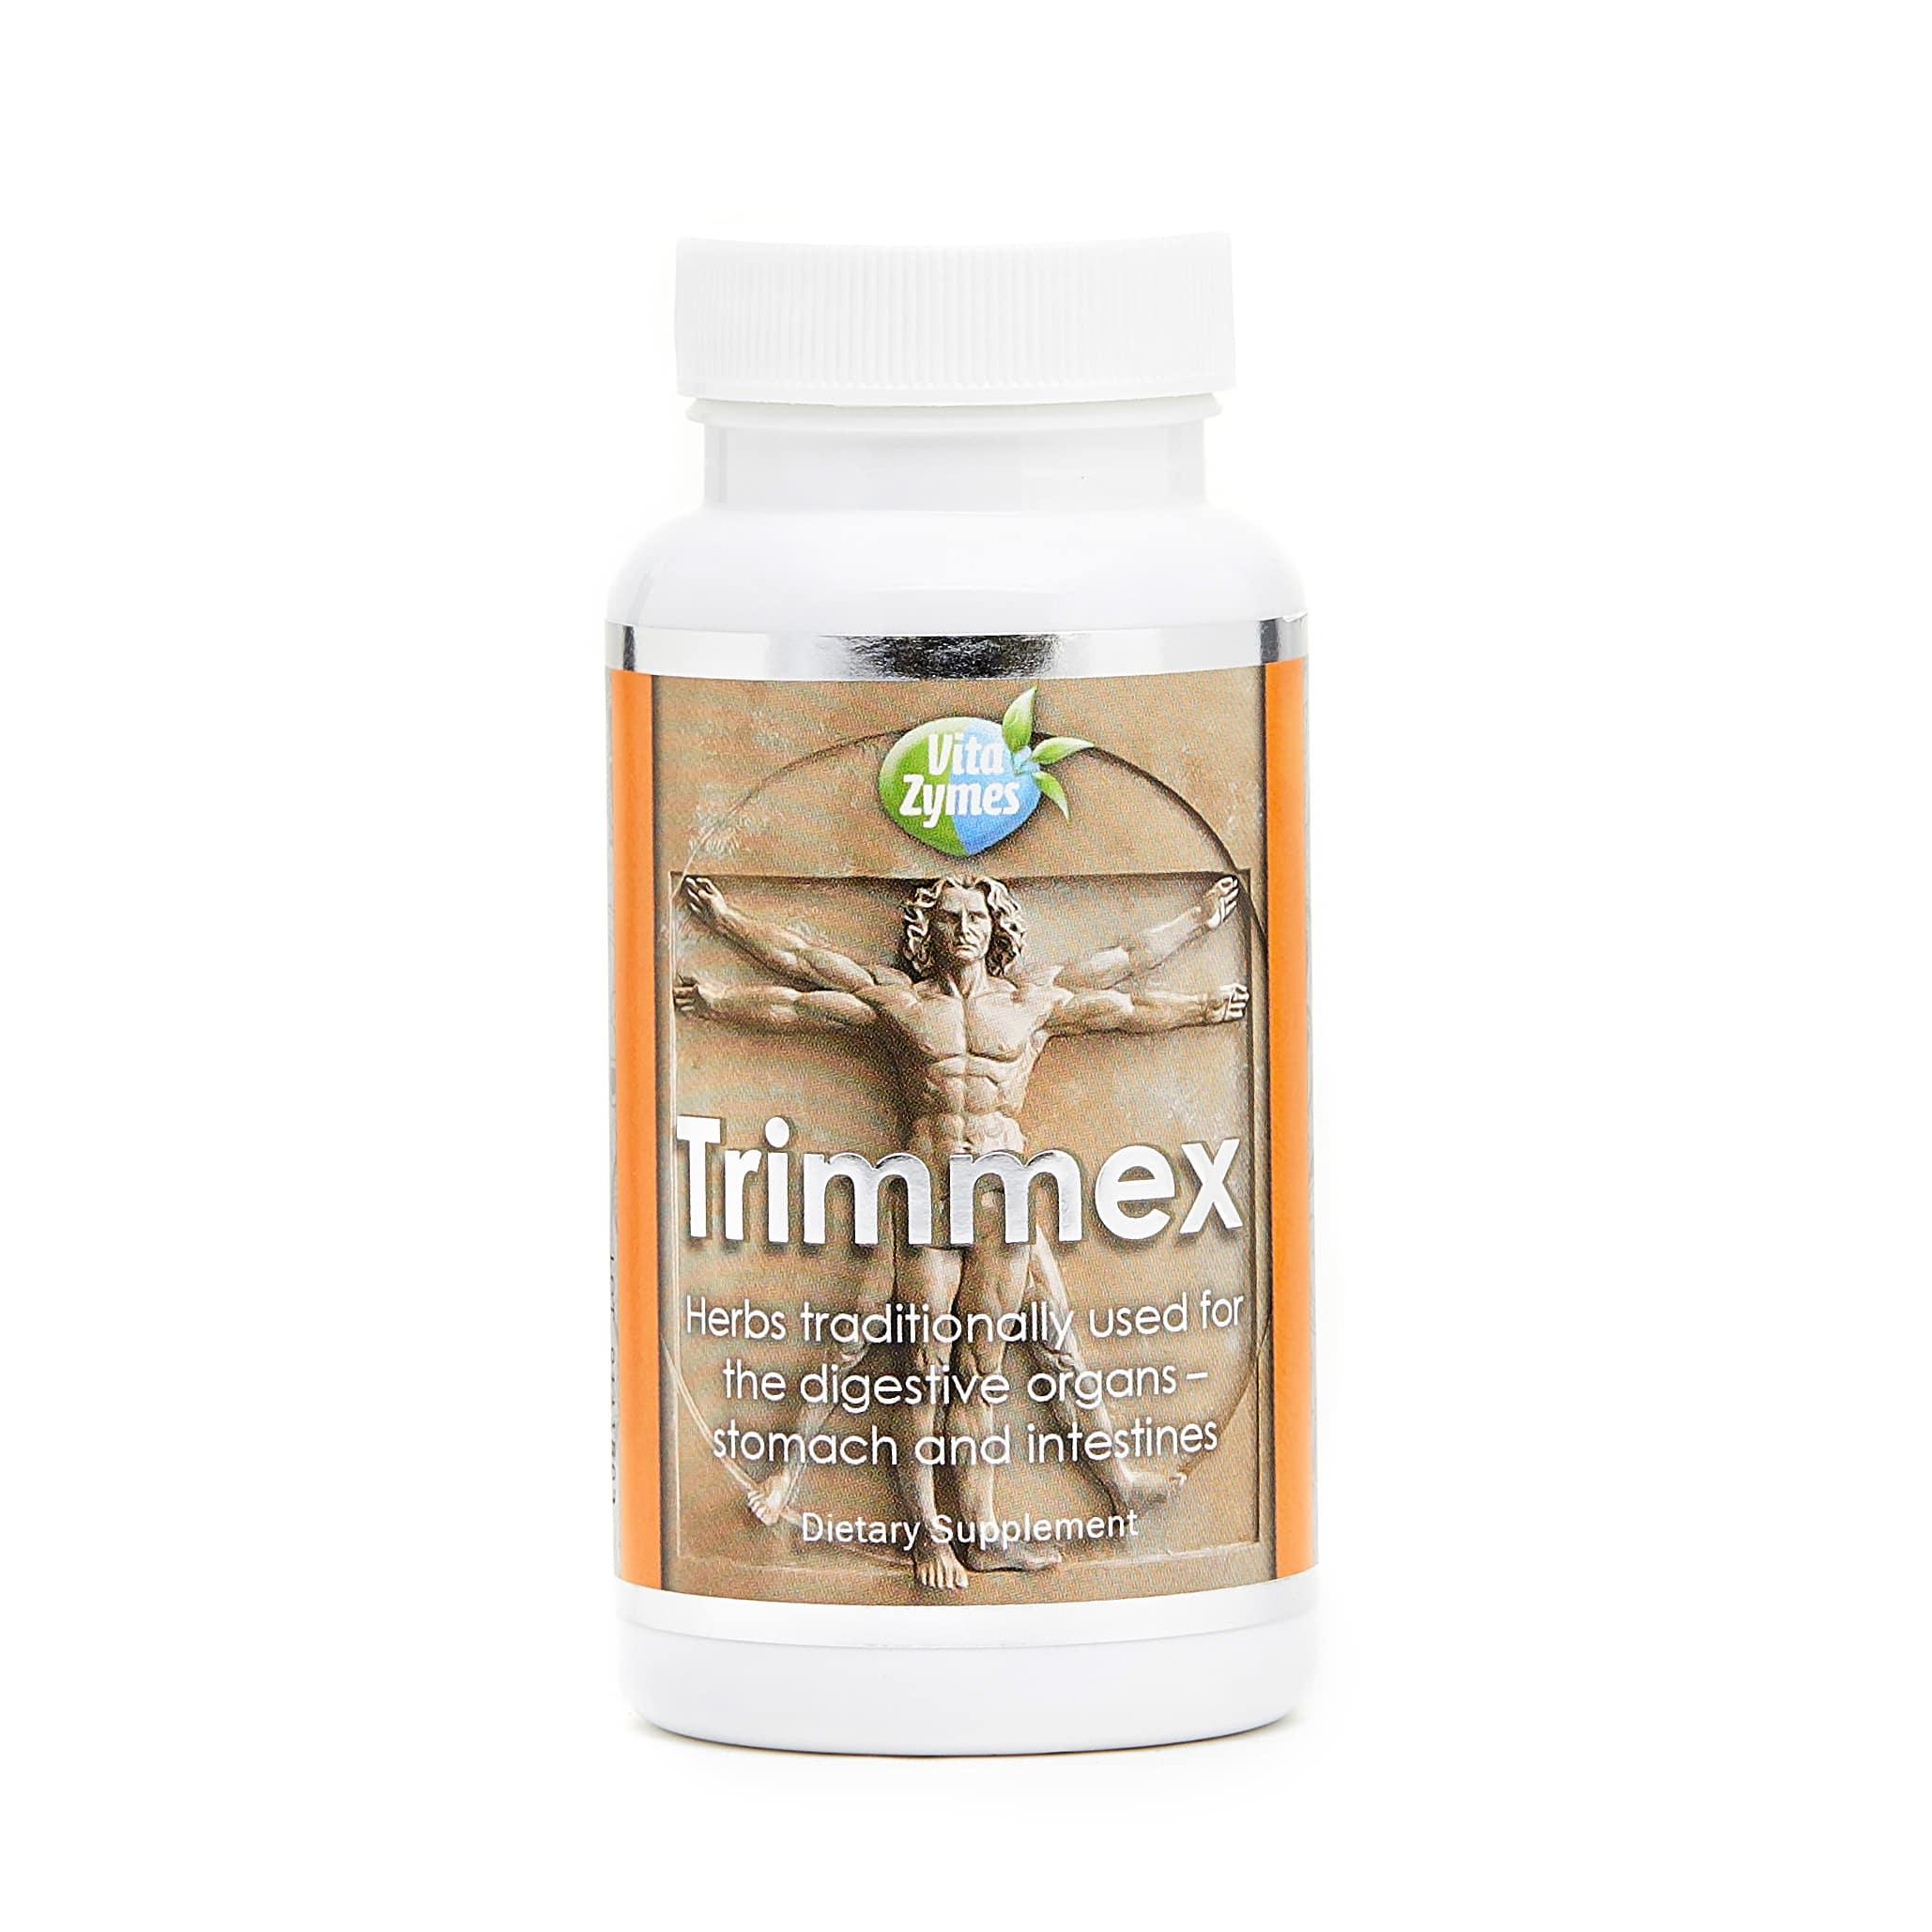 vitazymes-trimmex.